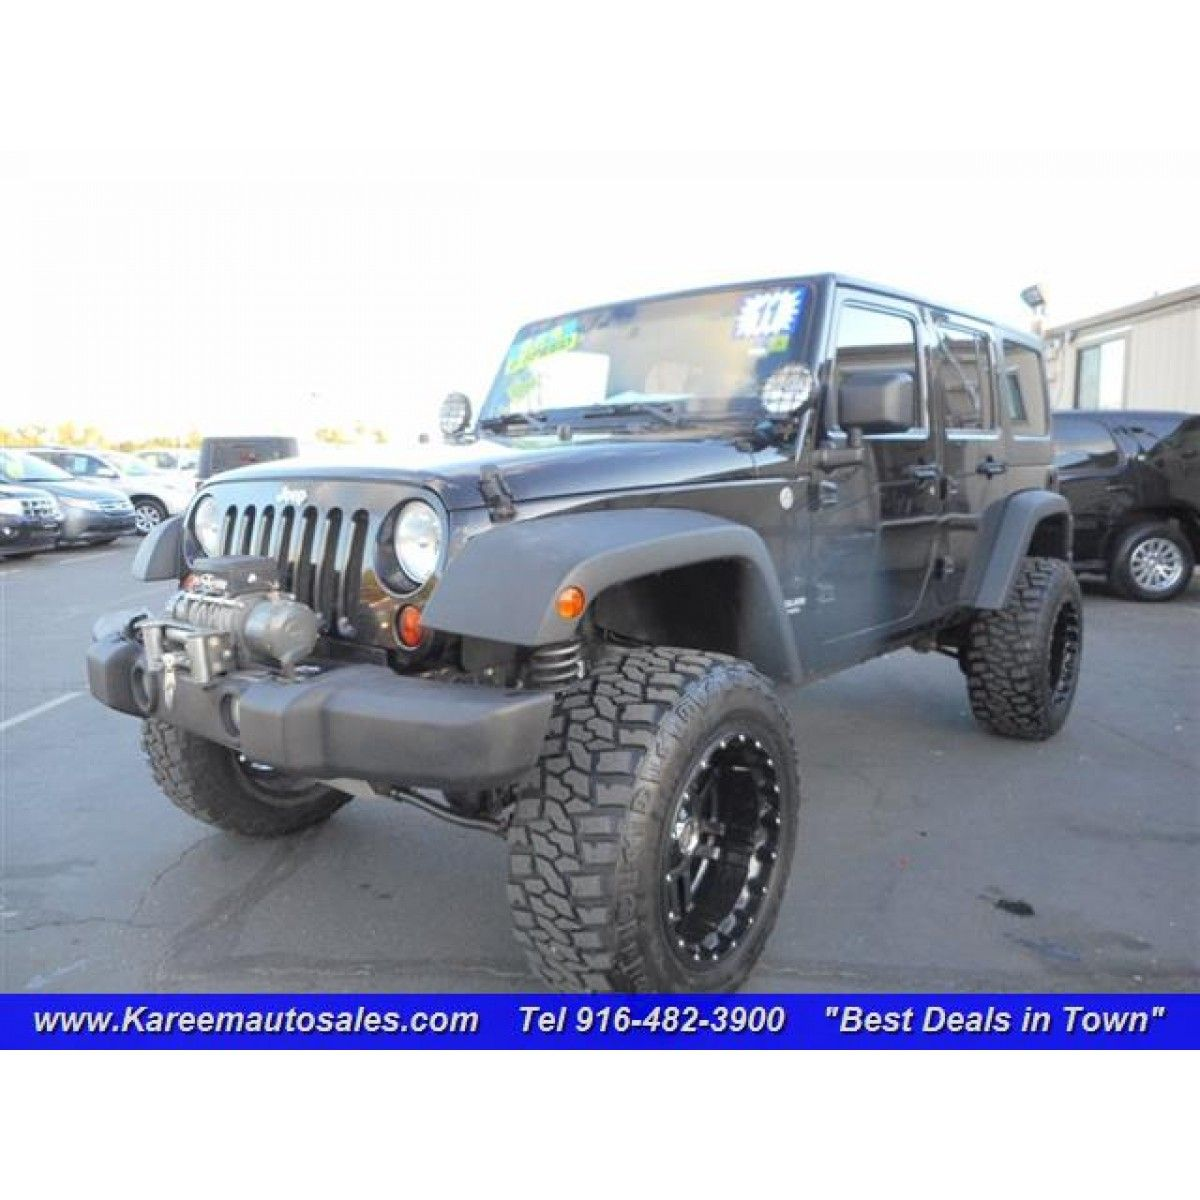 2011 jeep wrangler unlimited sport 4wd unlimited sport 4wd kareem auto sale 916 482